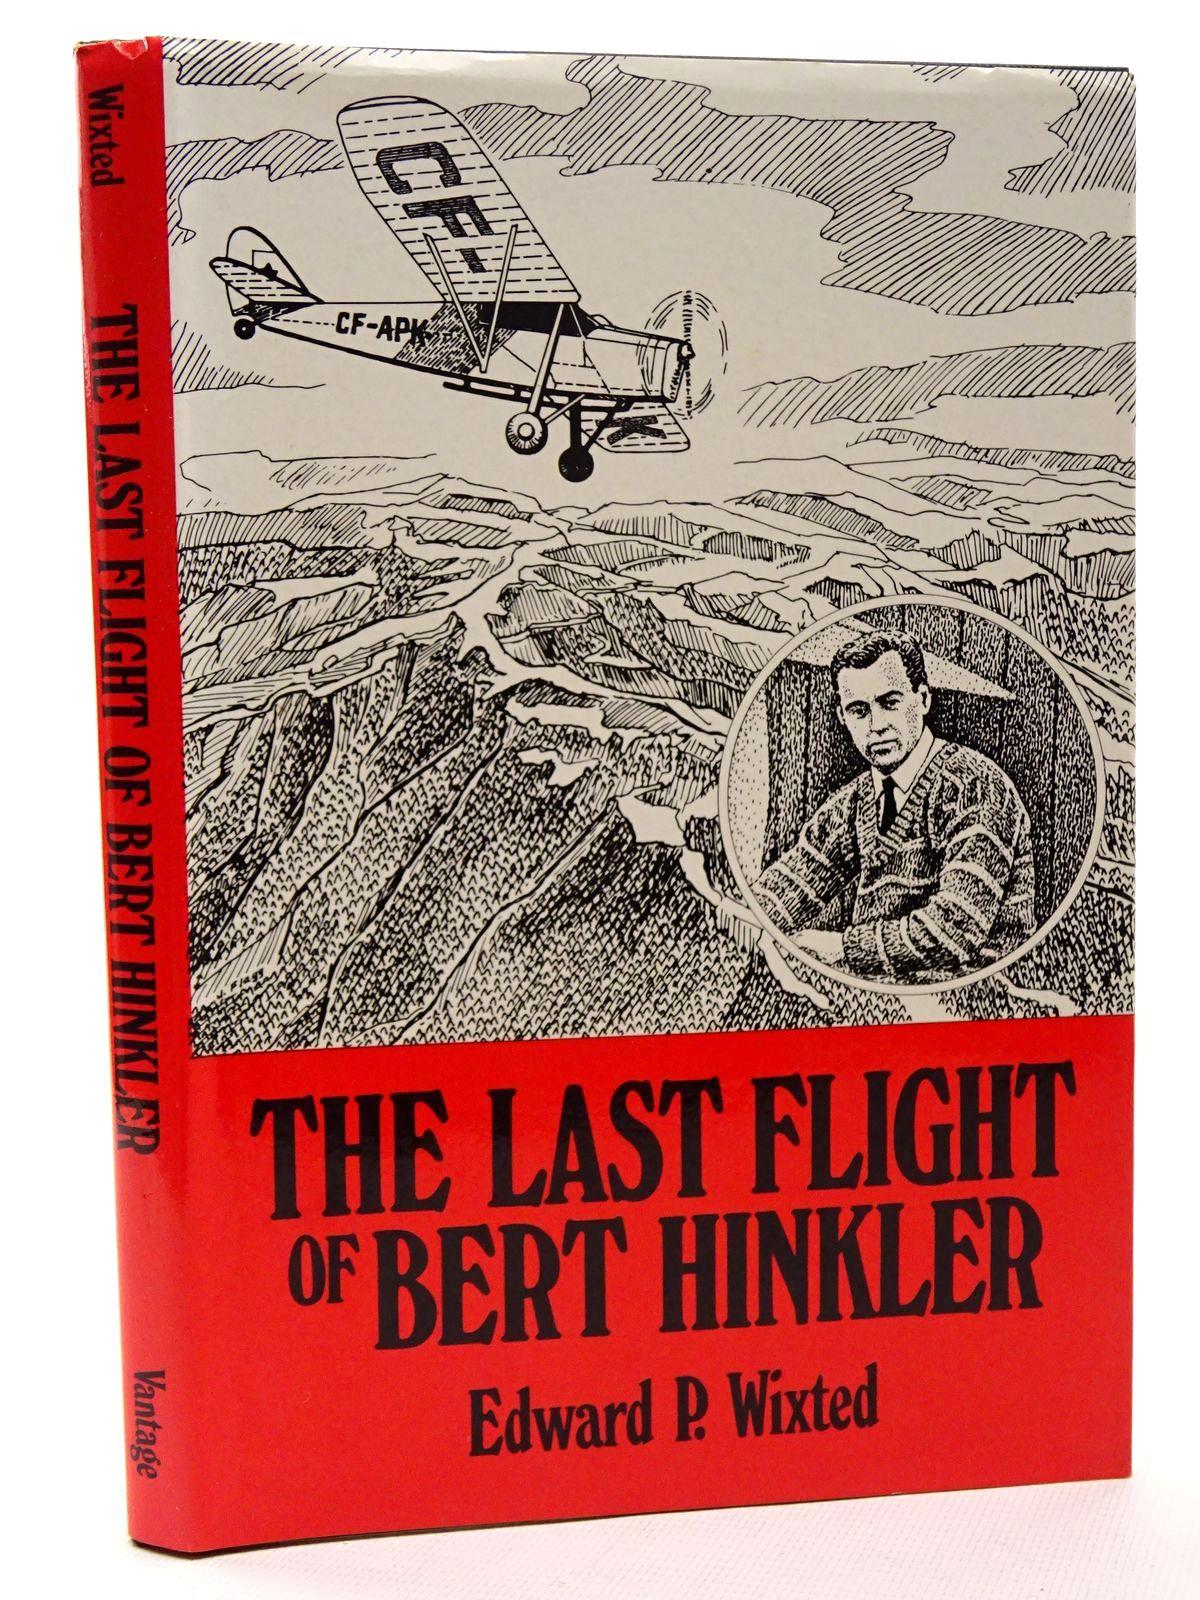 Photo of THE LAST FLIGHT OF BERT HINKLER- Stock Number: 1610234